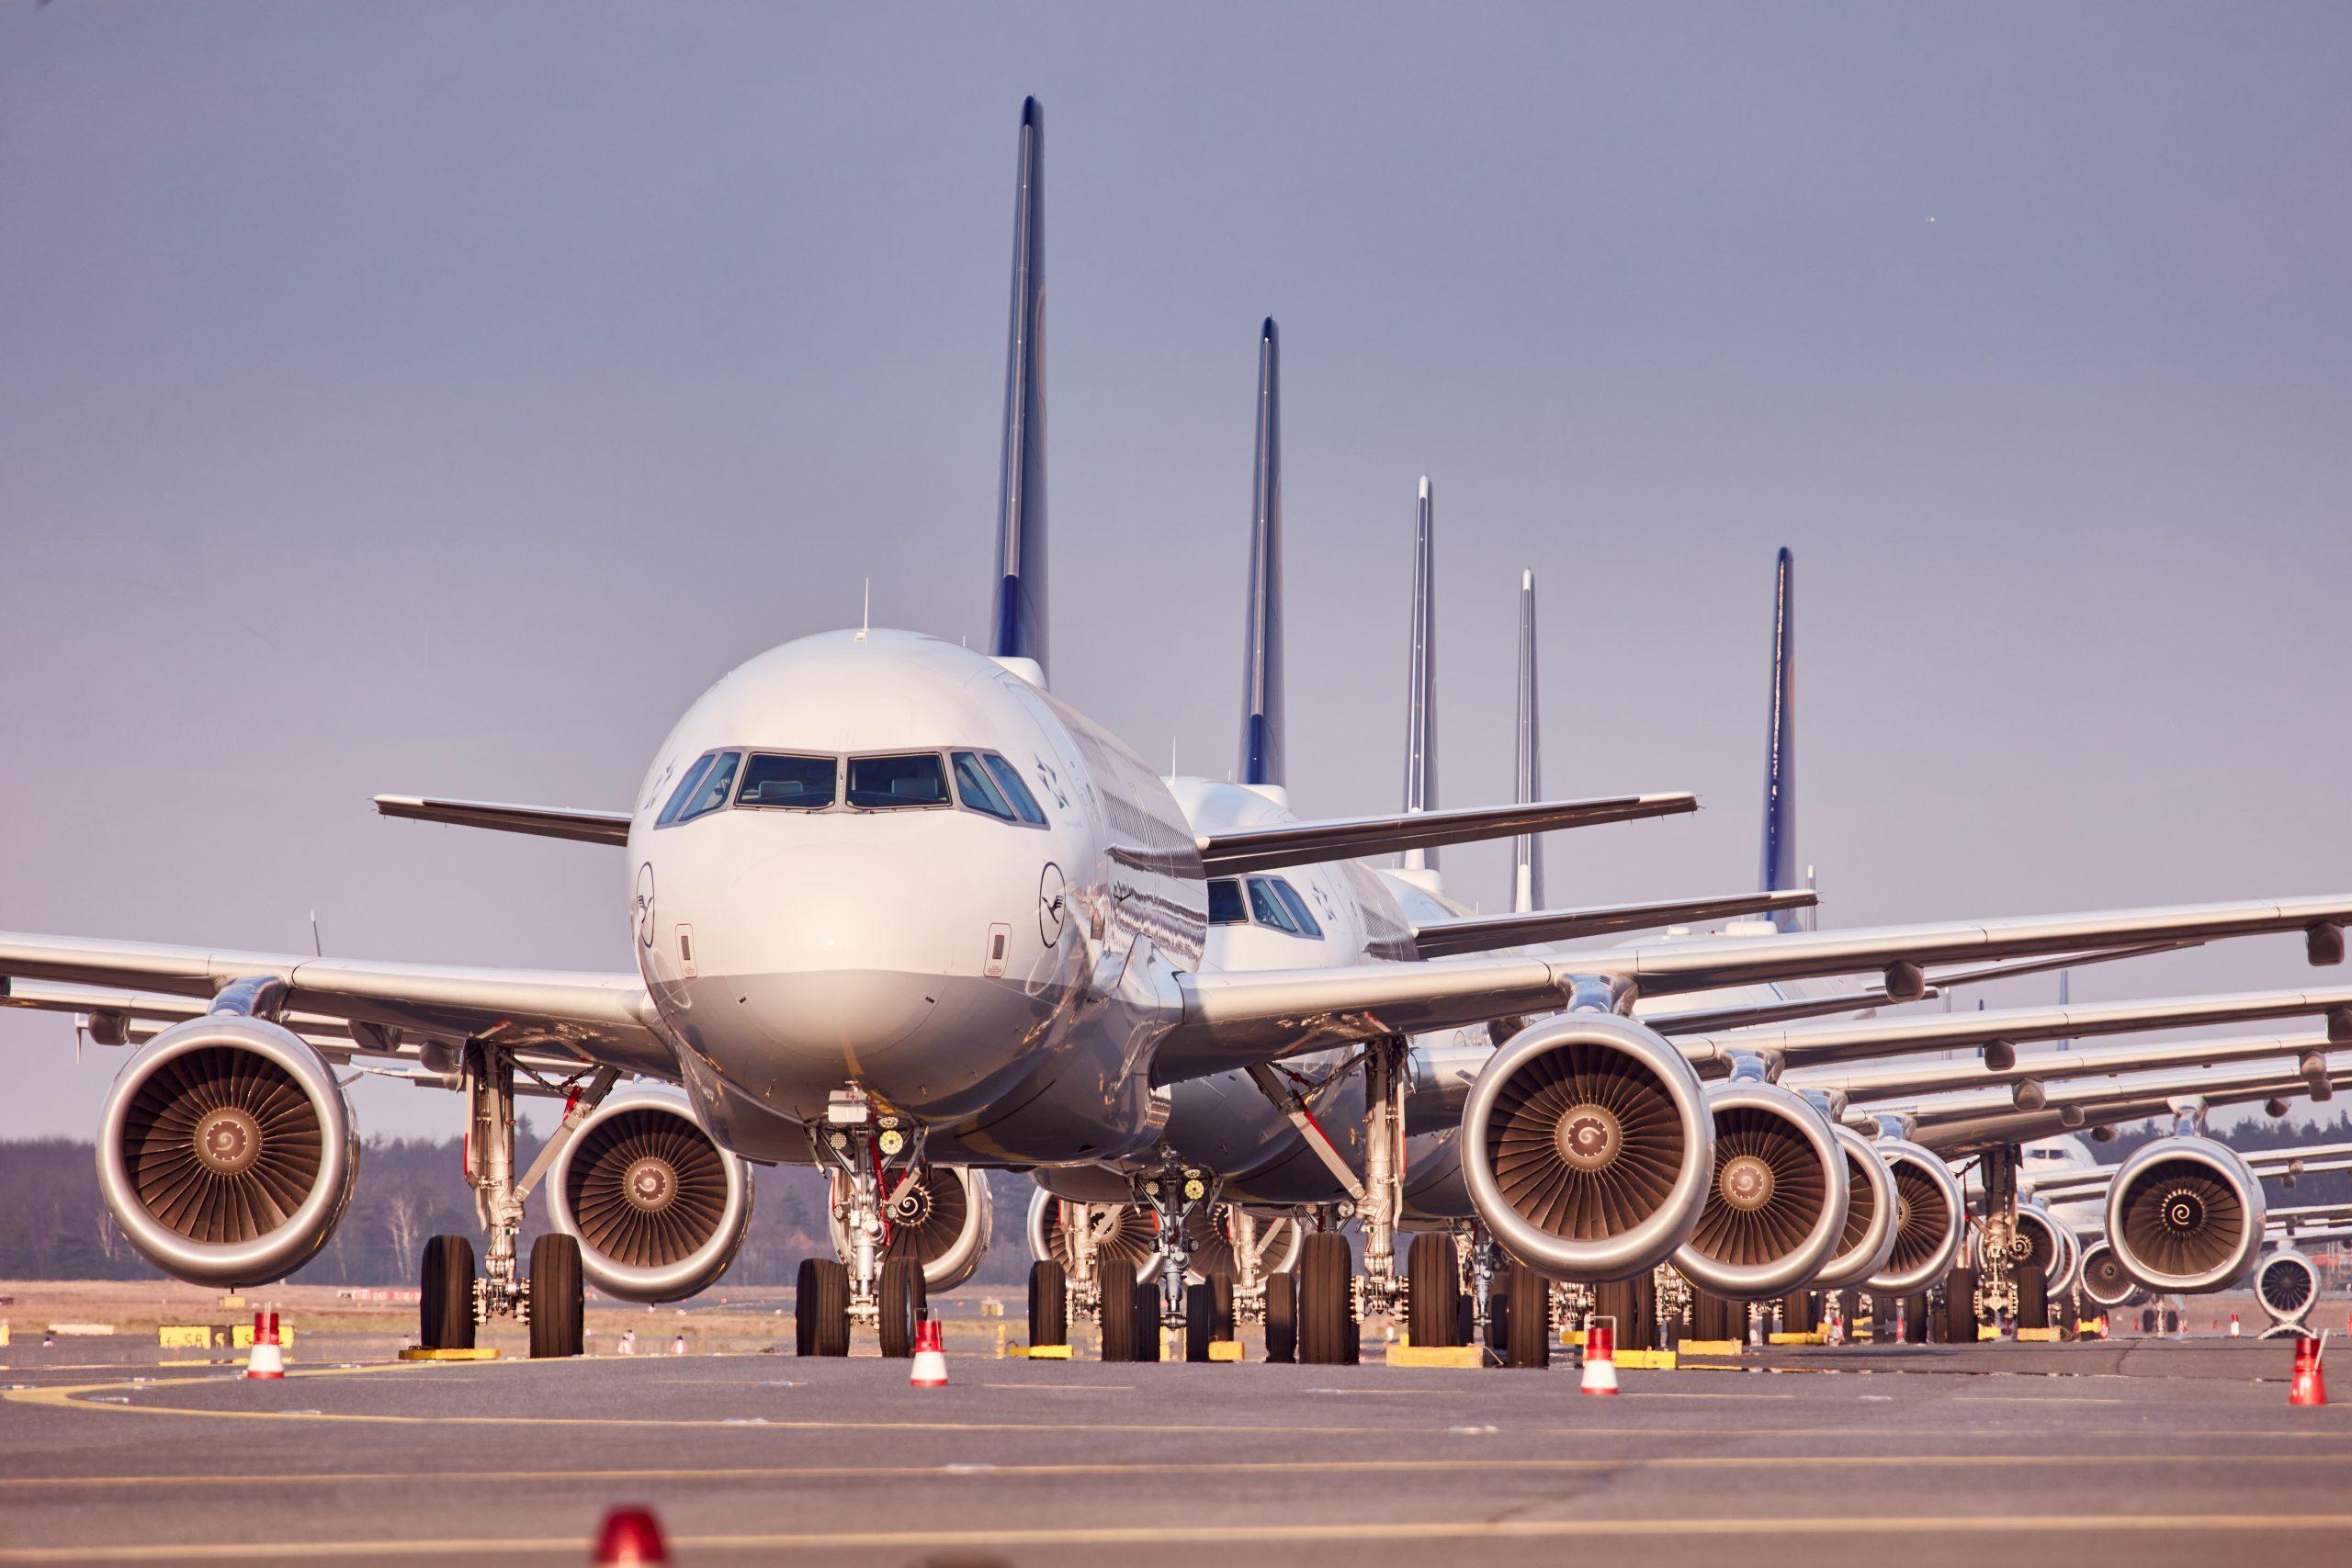 Parkerede fly fra Lufthansa (Lufthansa | PR)